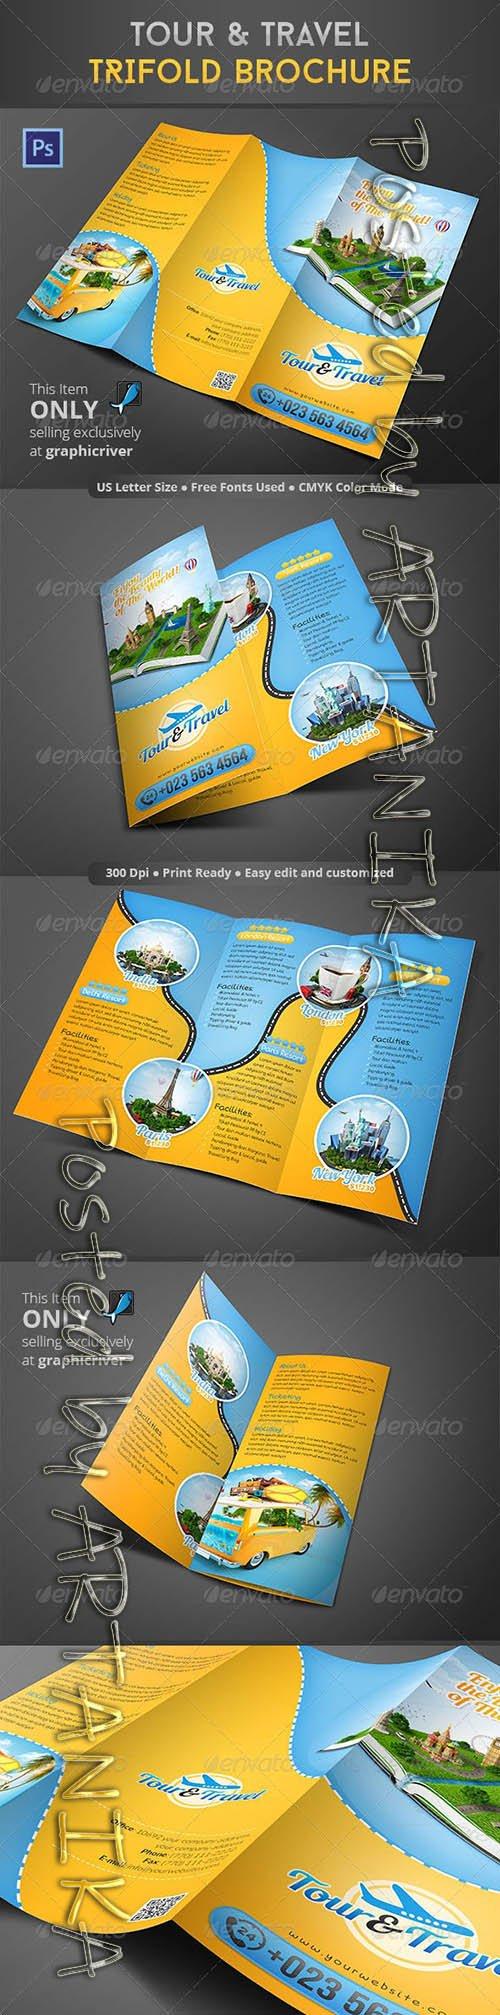 Tour & Travel Trifold Brochure 8610213